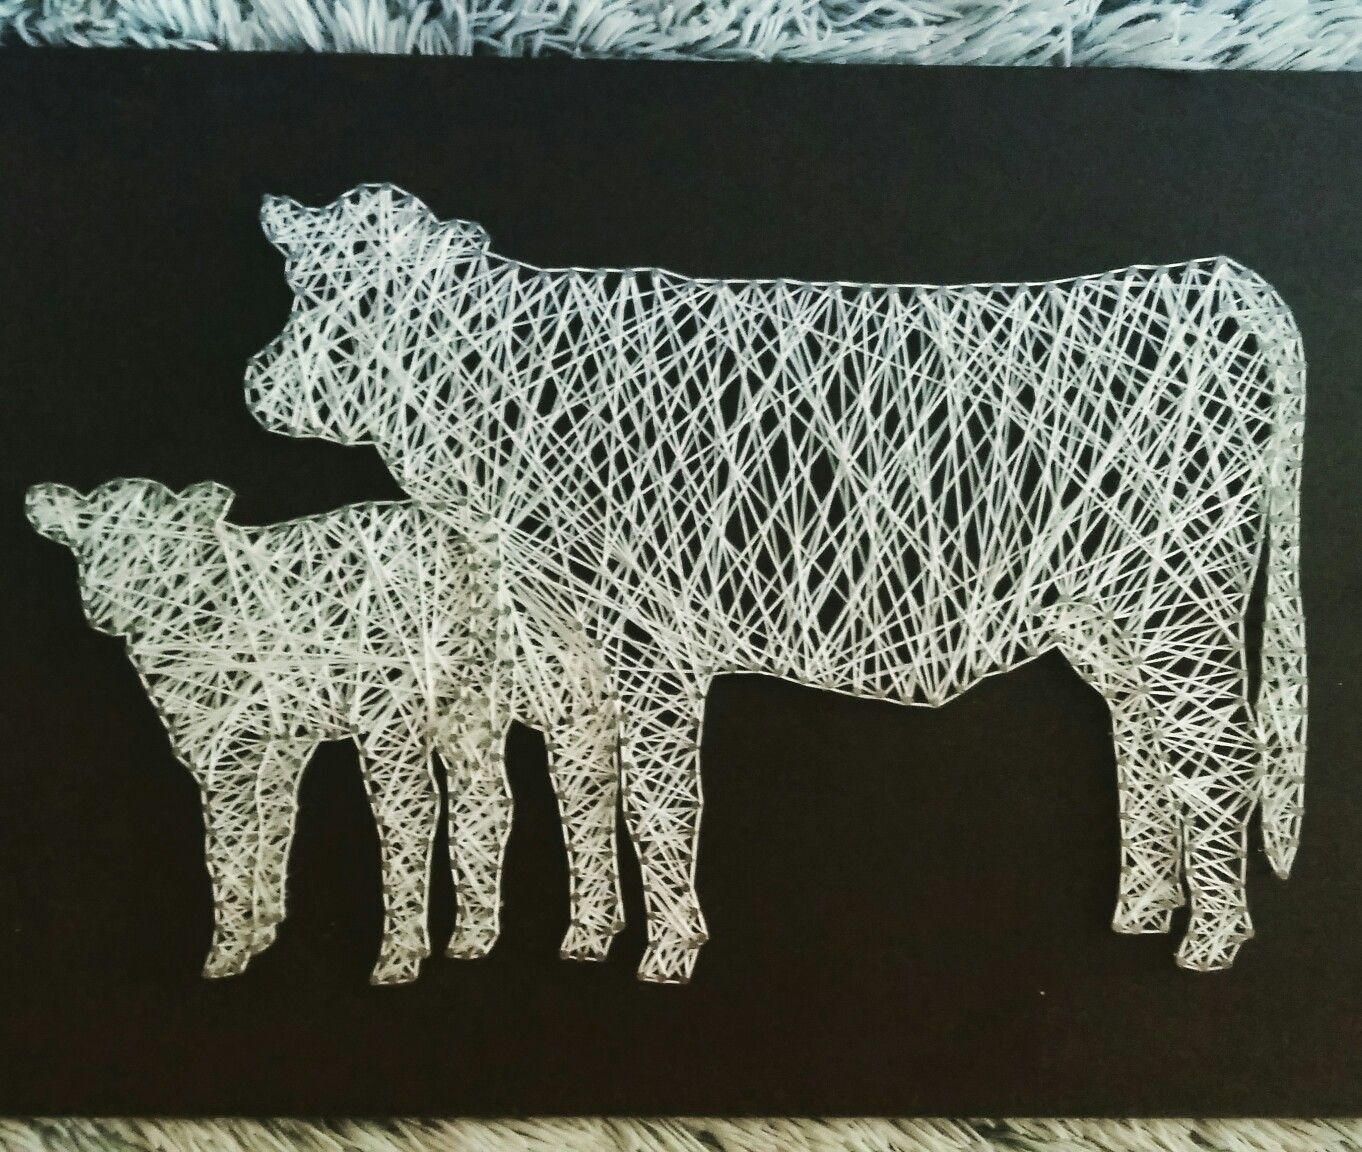 Cow string art by HunGabi